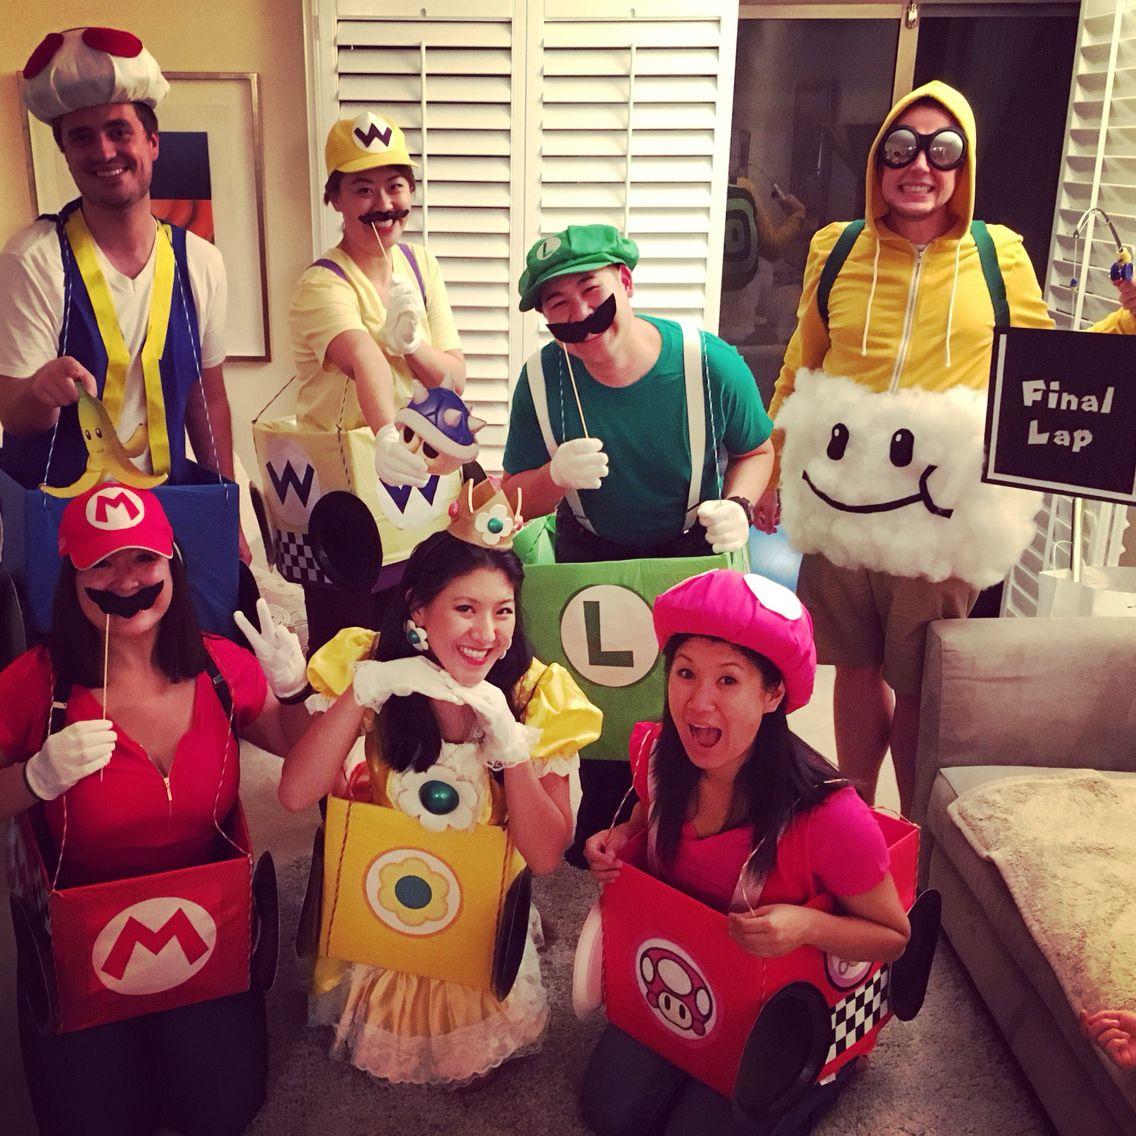 Group costume idea - Mario Kart   Luigi, Mario, Princess Daisy, Toad, Toadette, Wario, Cloud Guy